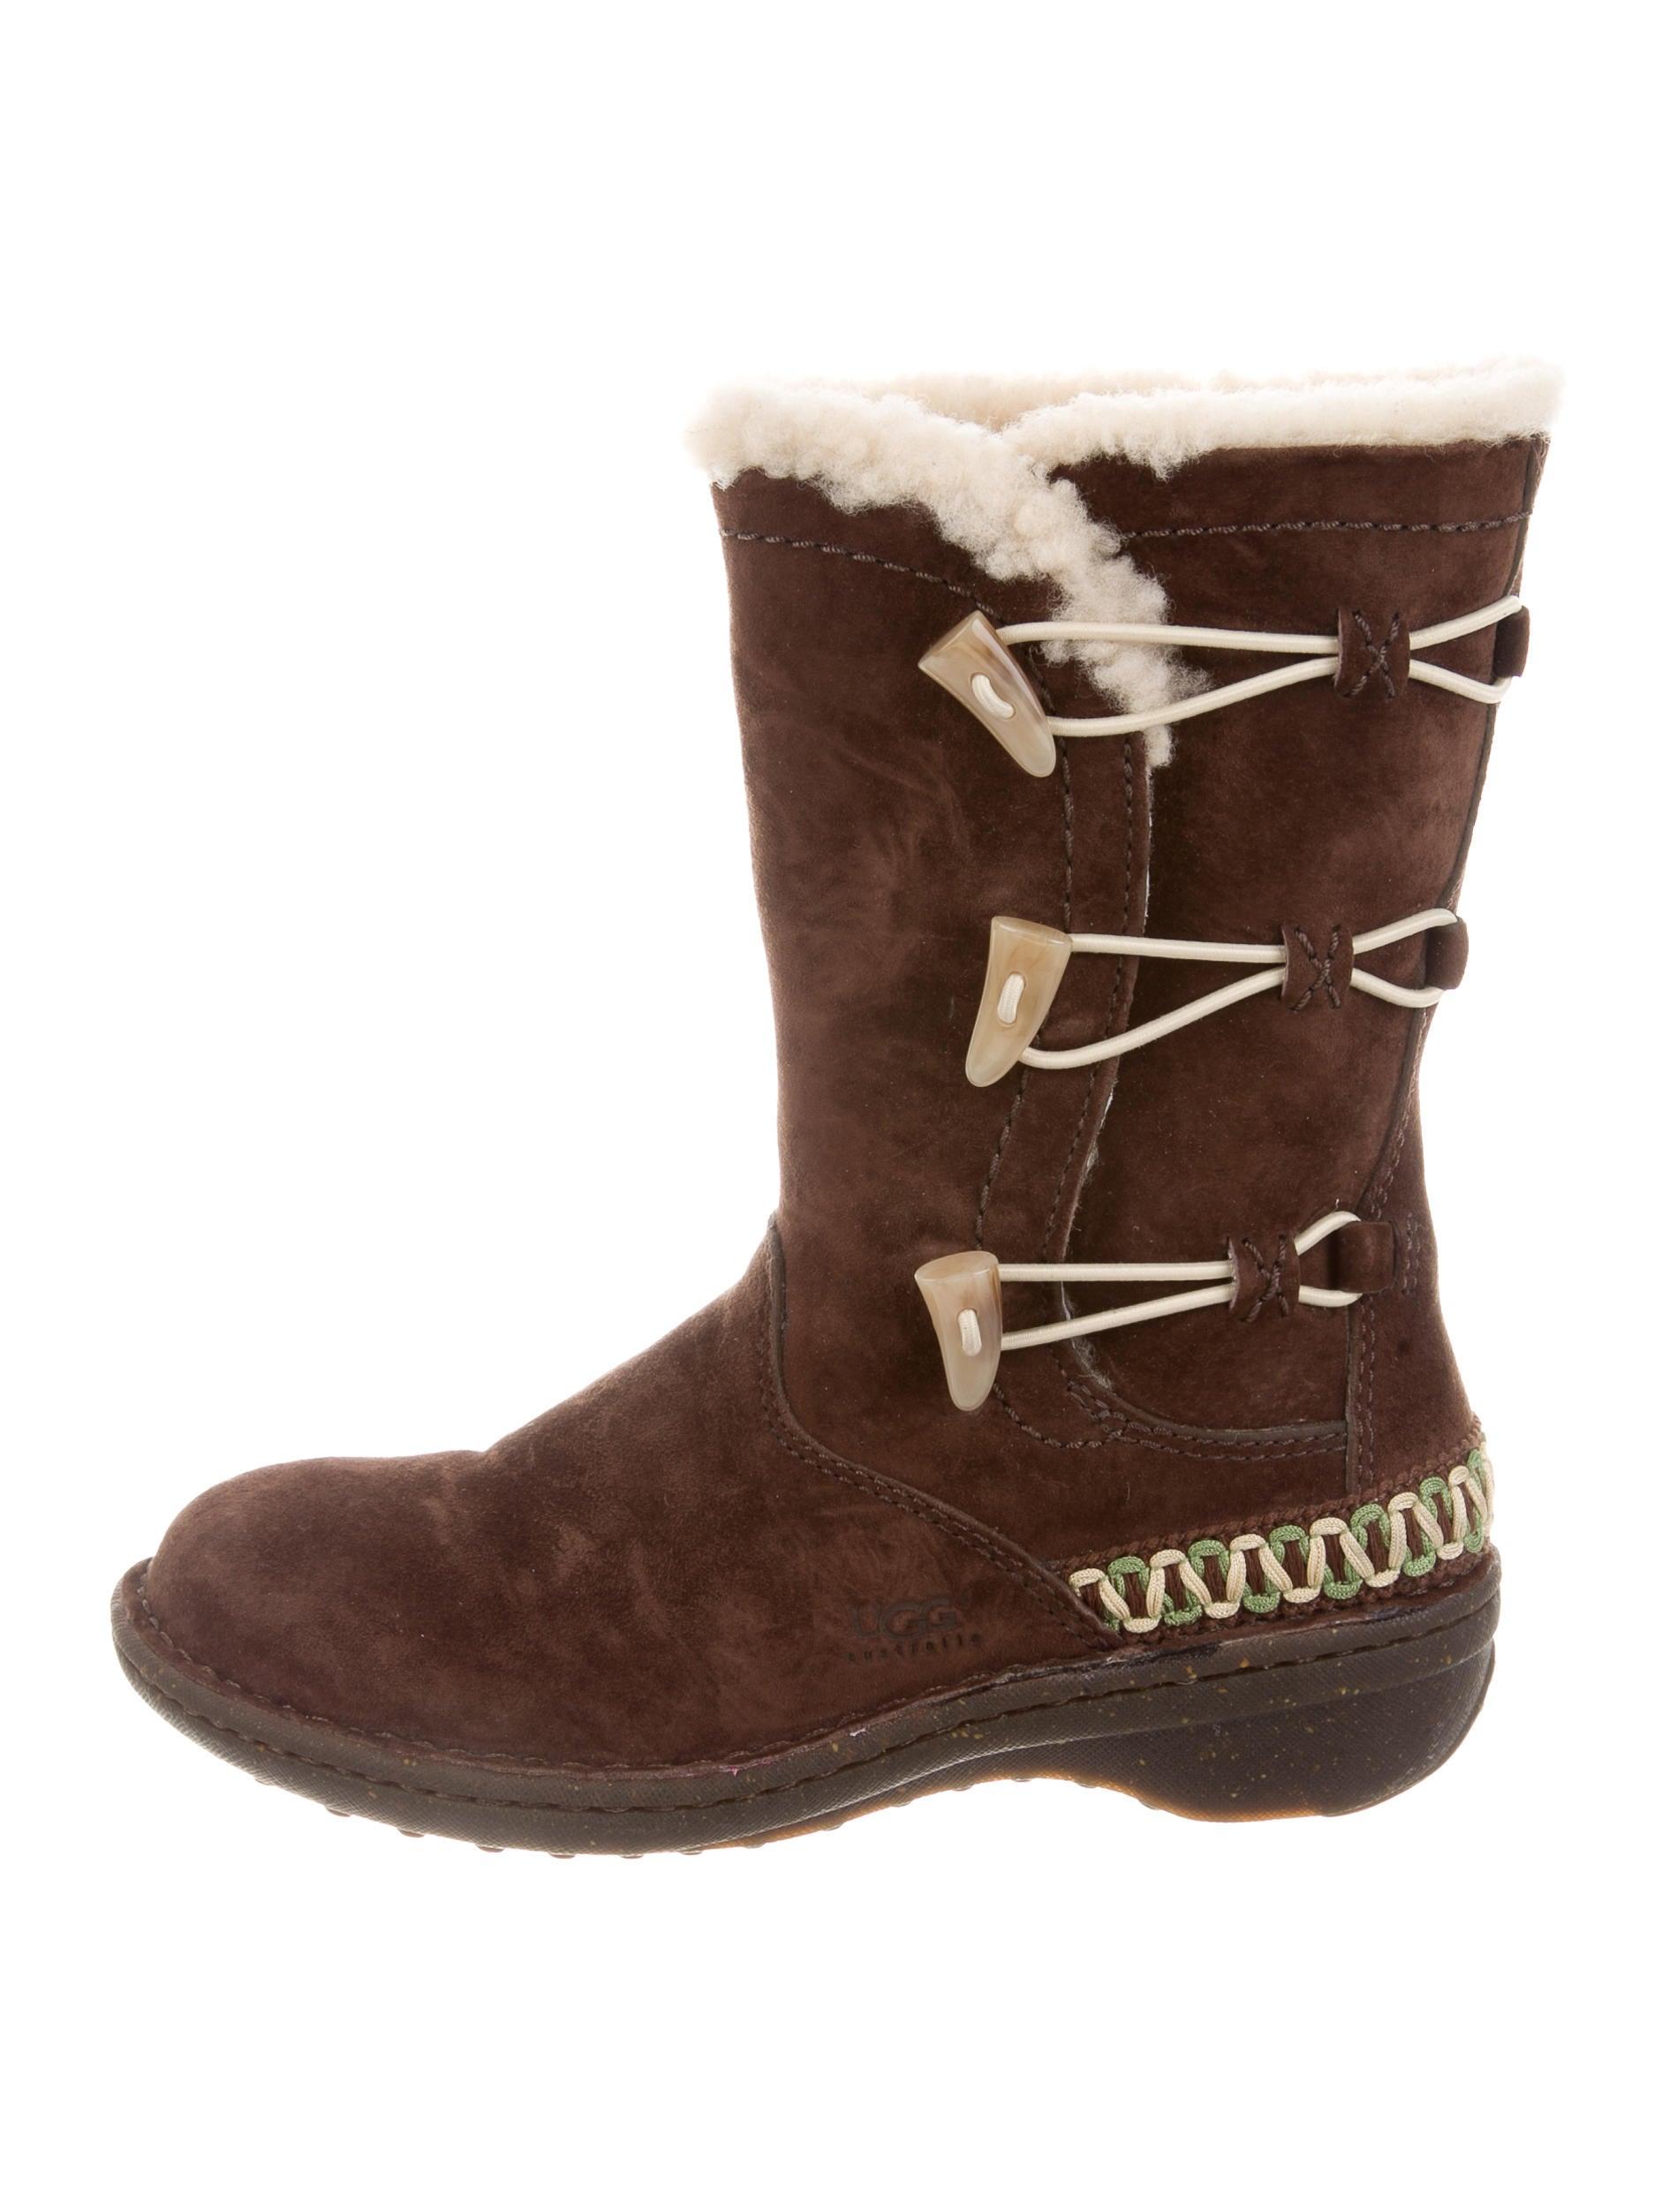 Kona Mid-Calf Boots